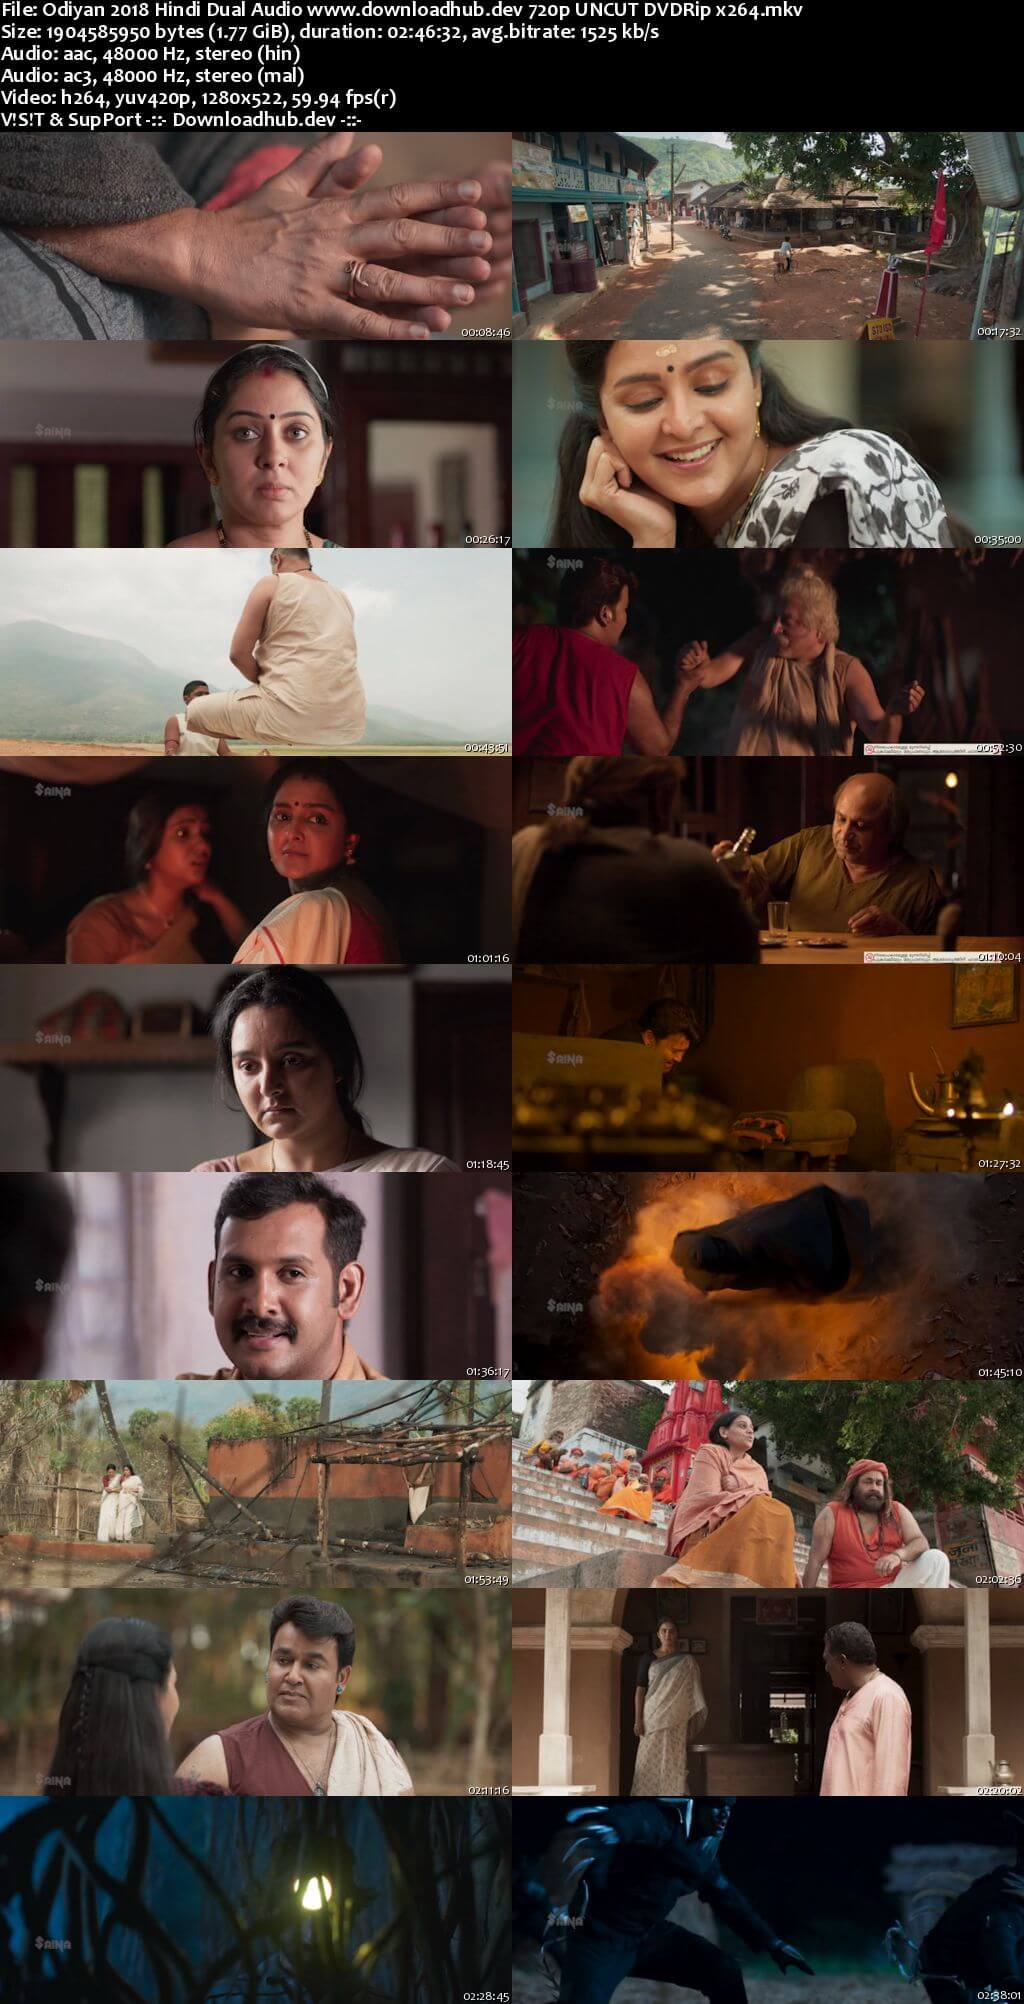 Odiyan 2018 Hindi Dual Audio 720p UNCUT DVDRip x264